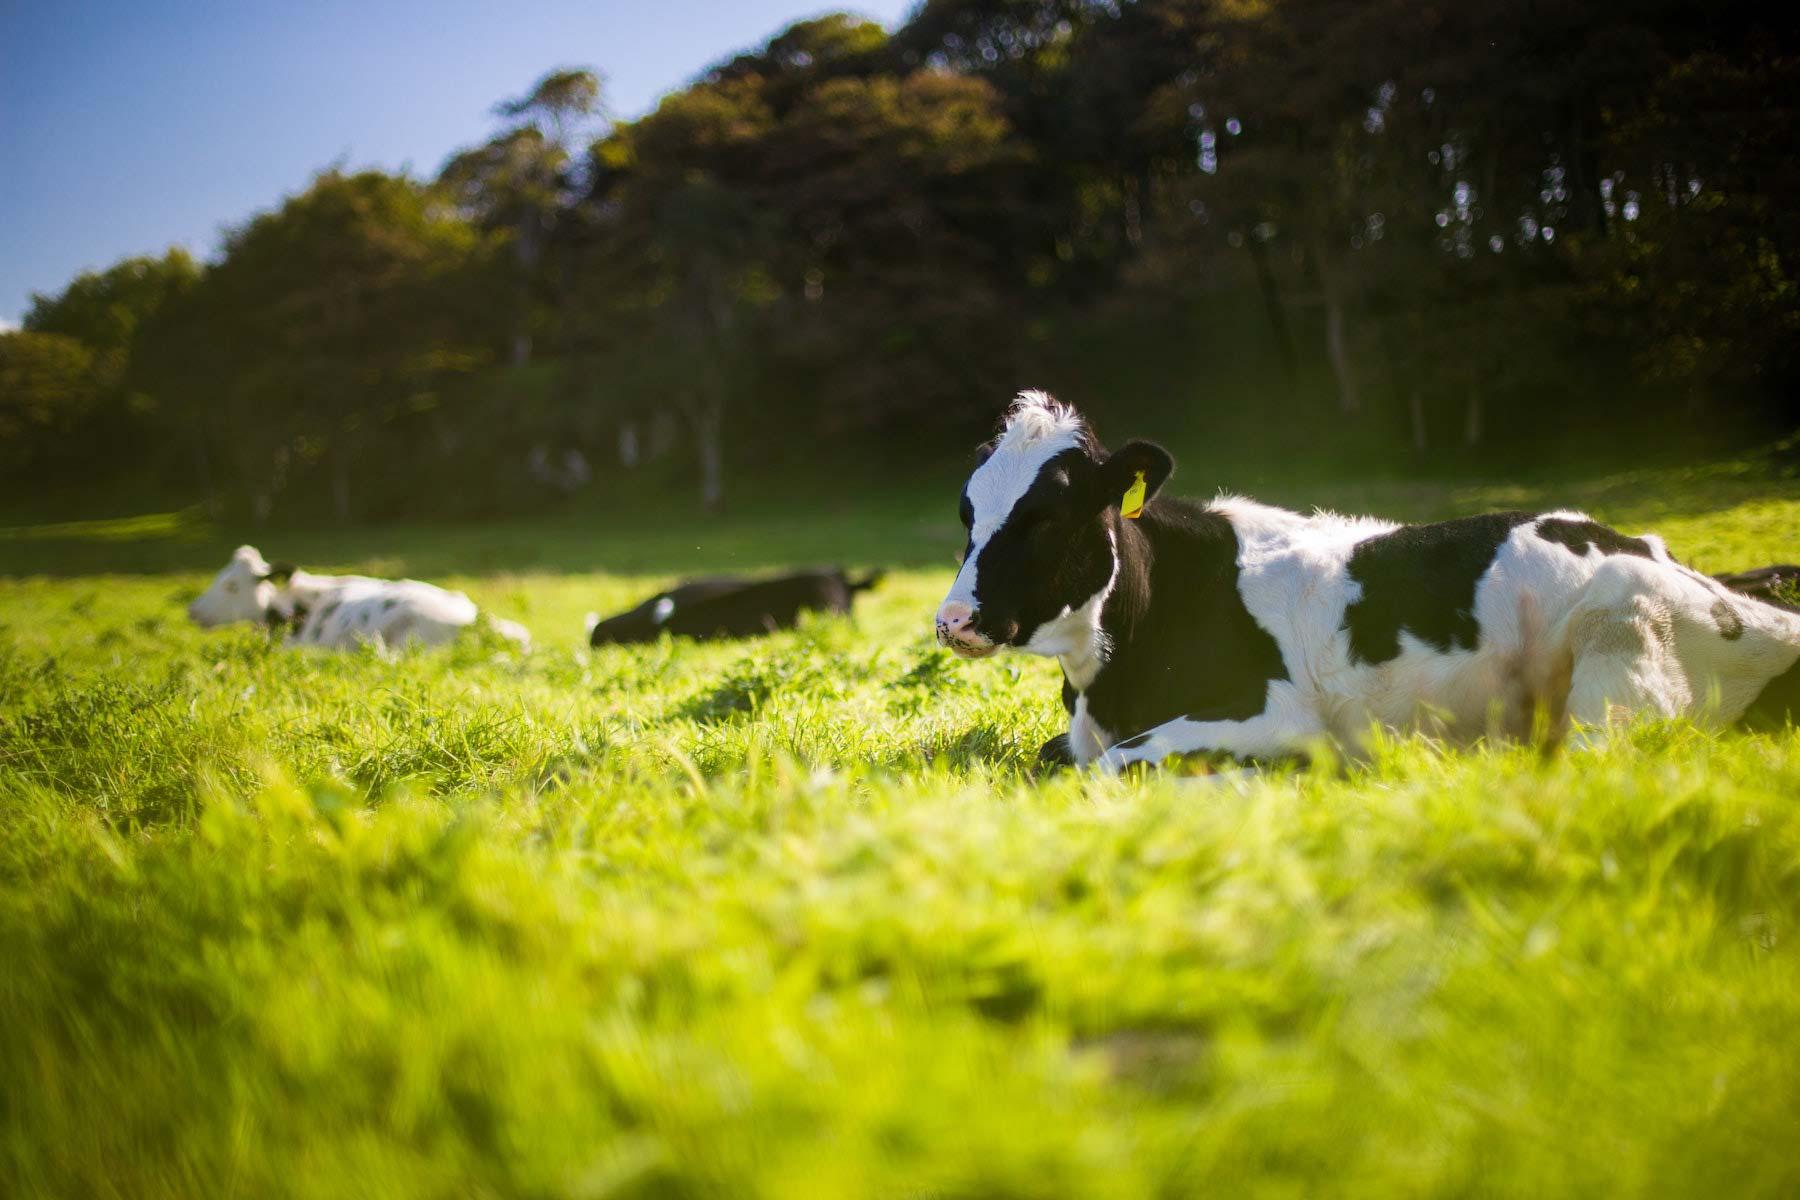 Dairy-Free has many benefits